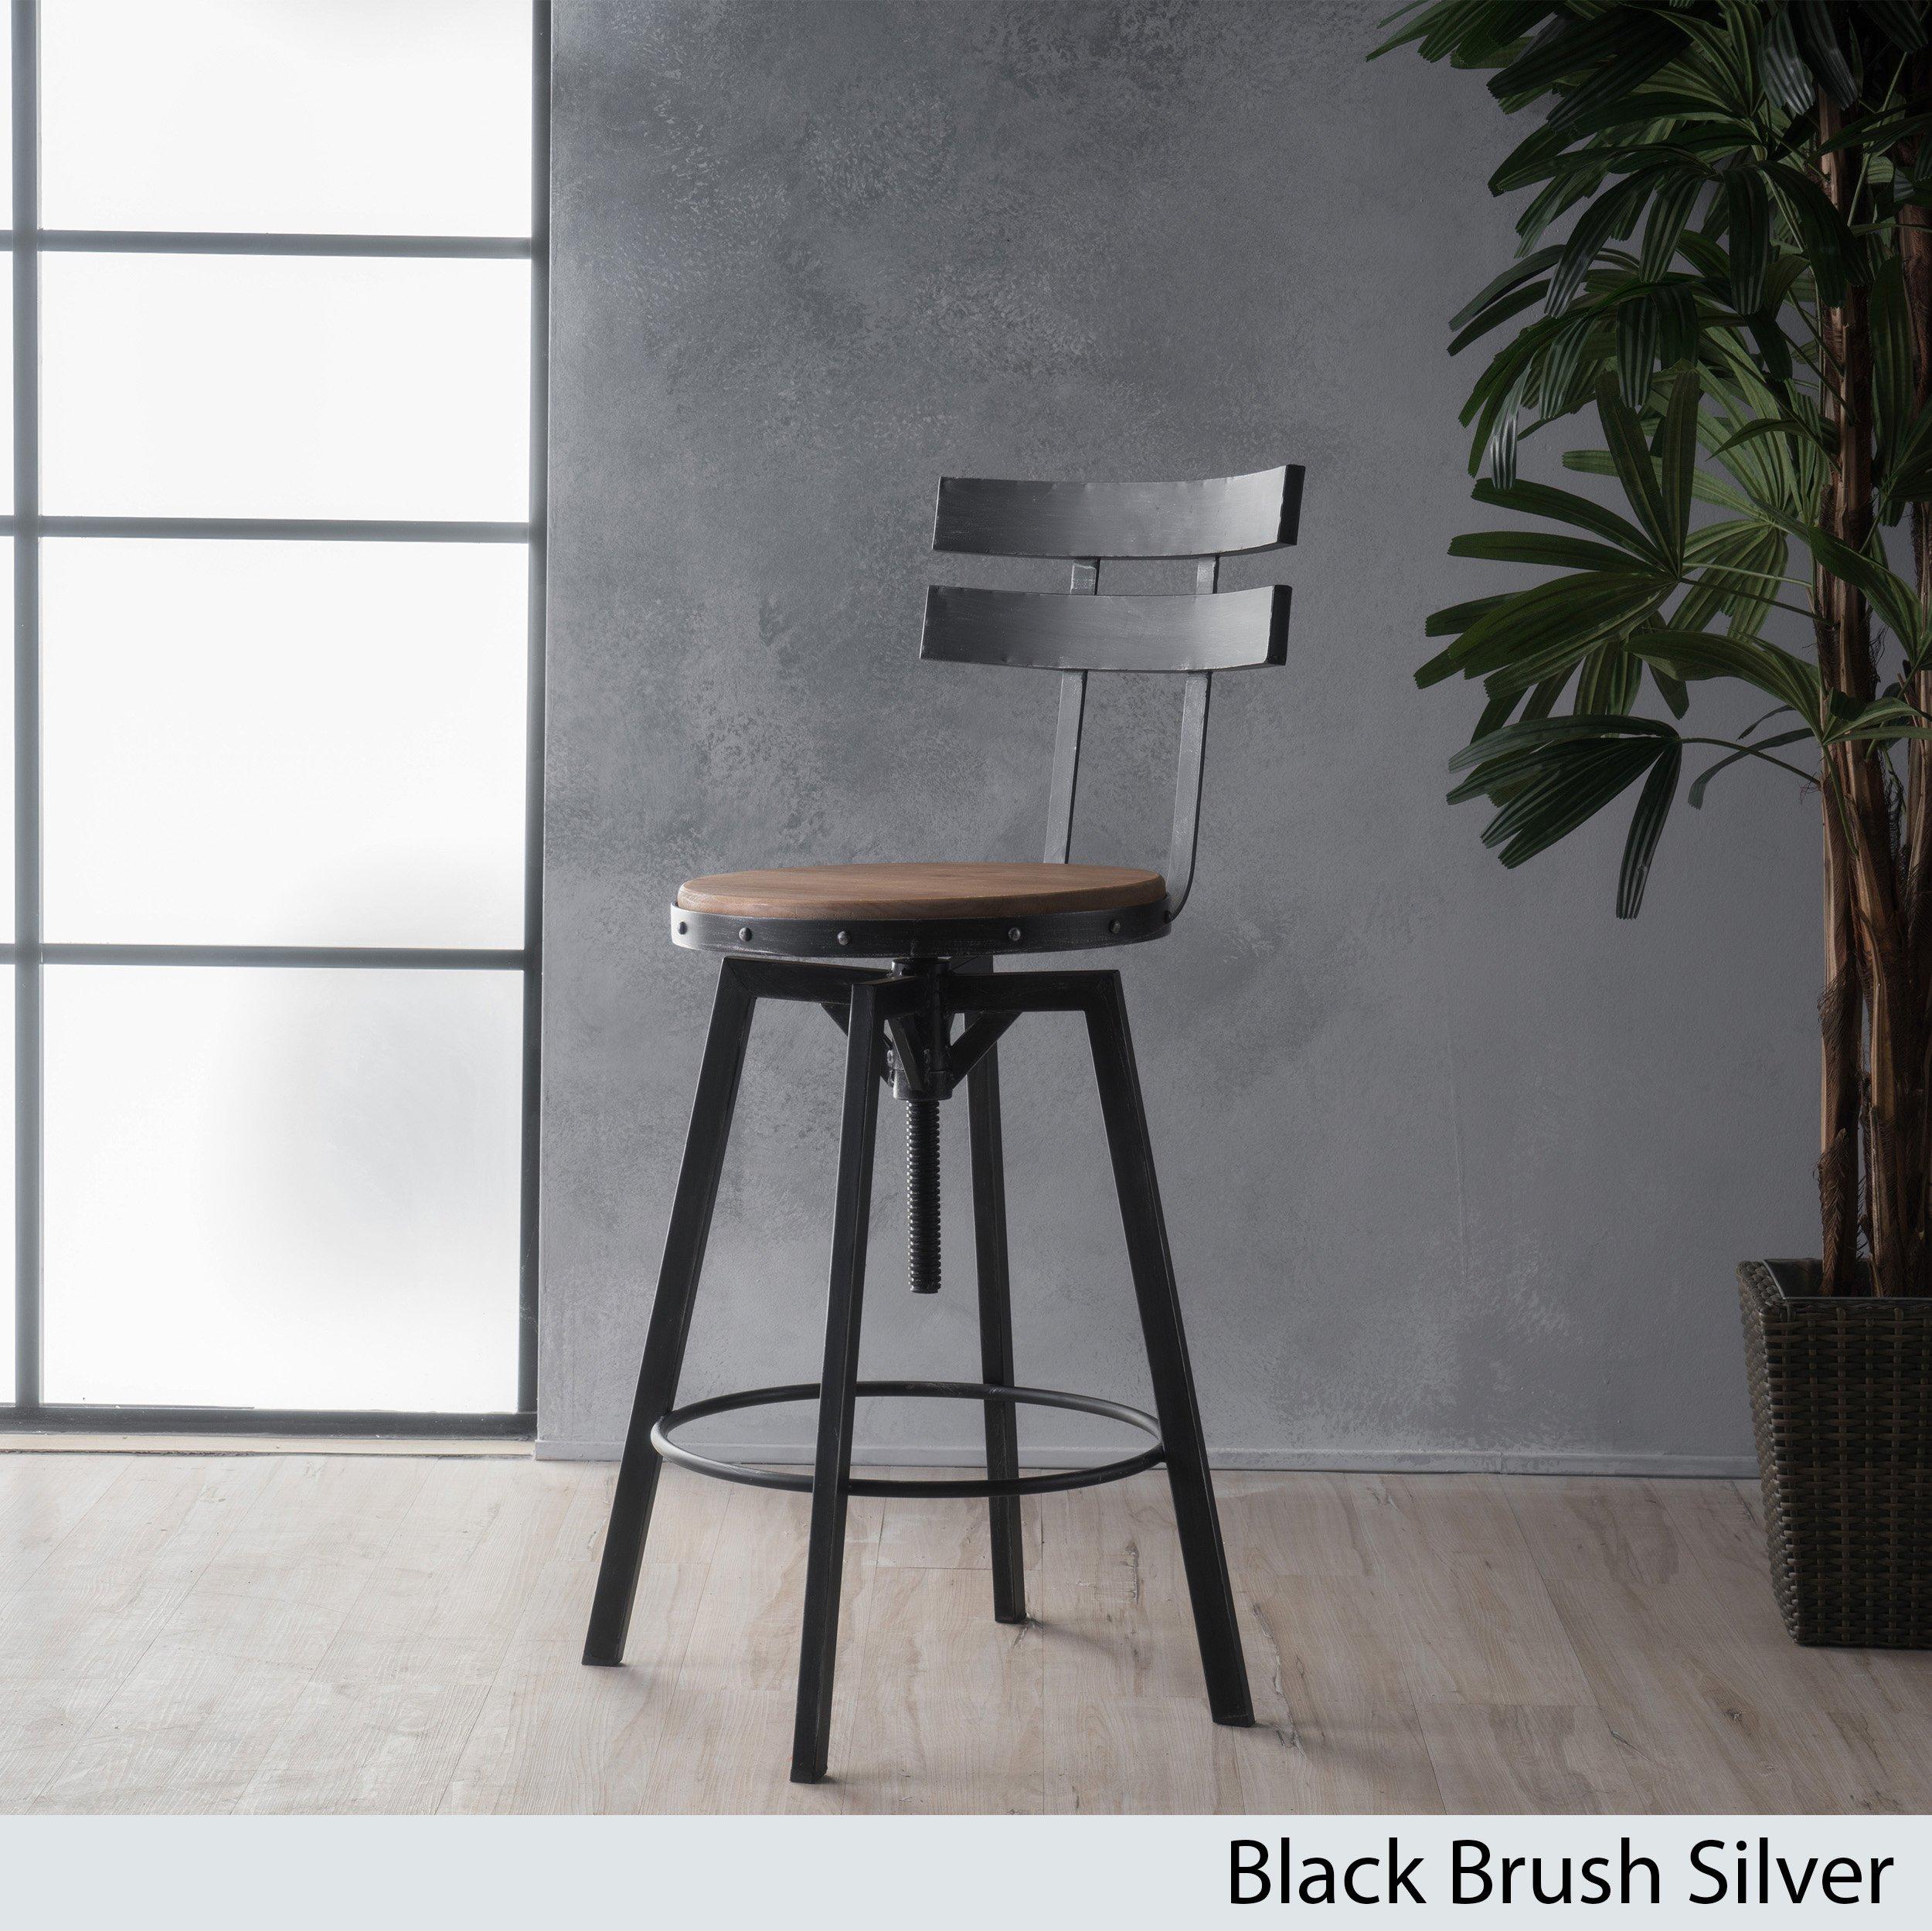 Jutte Black Brush Silver Firwood Smooth Back Bar Stool Christopher Knight Home